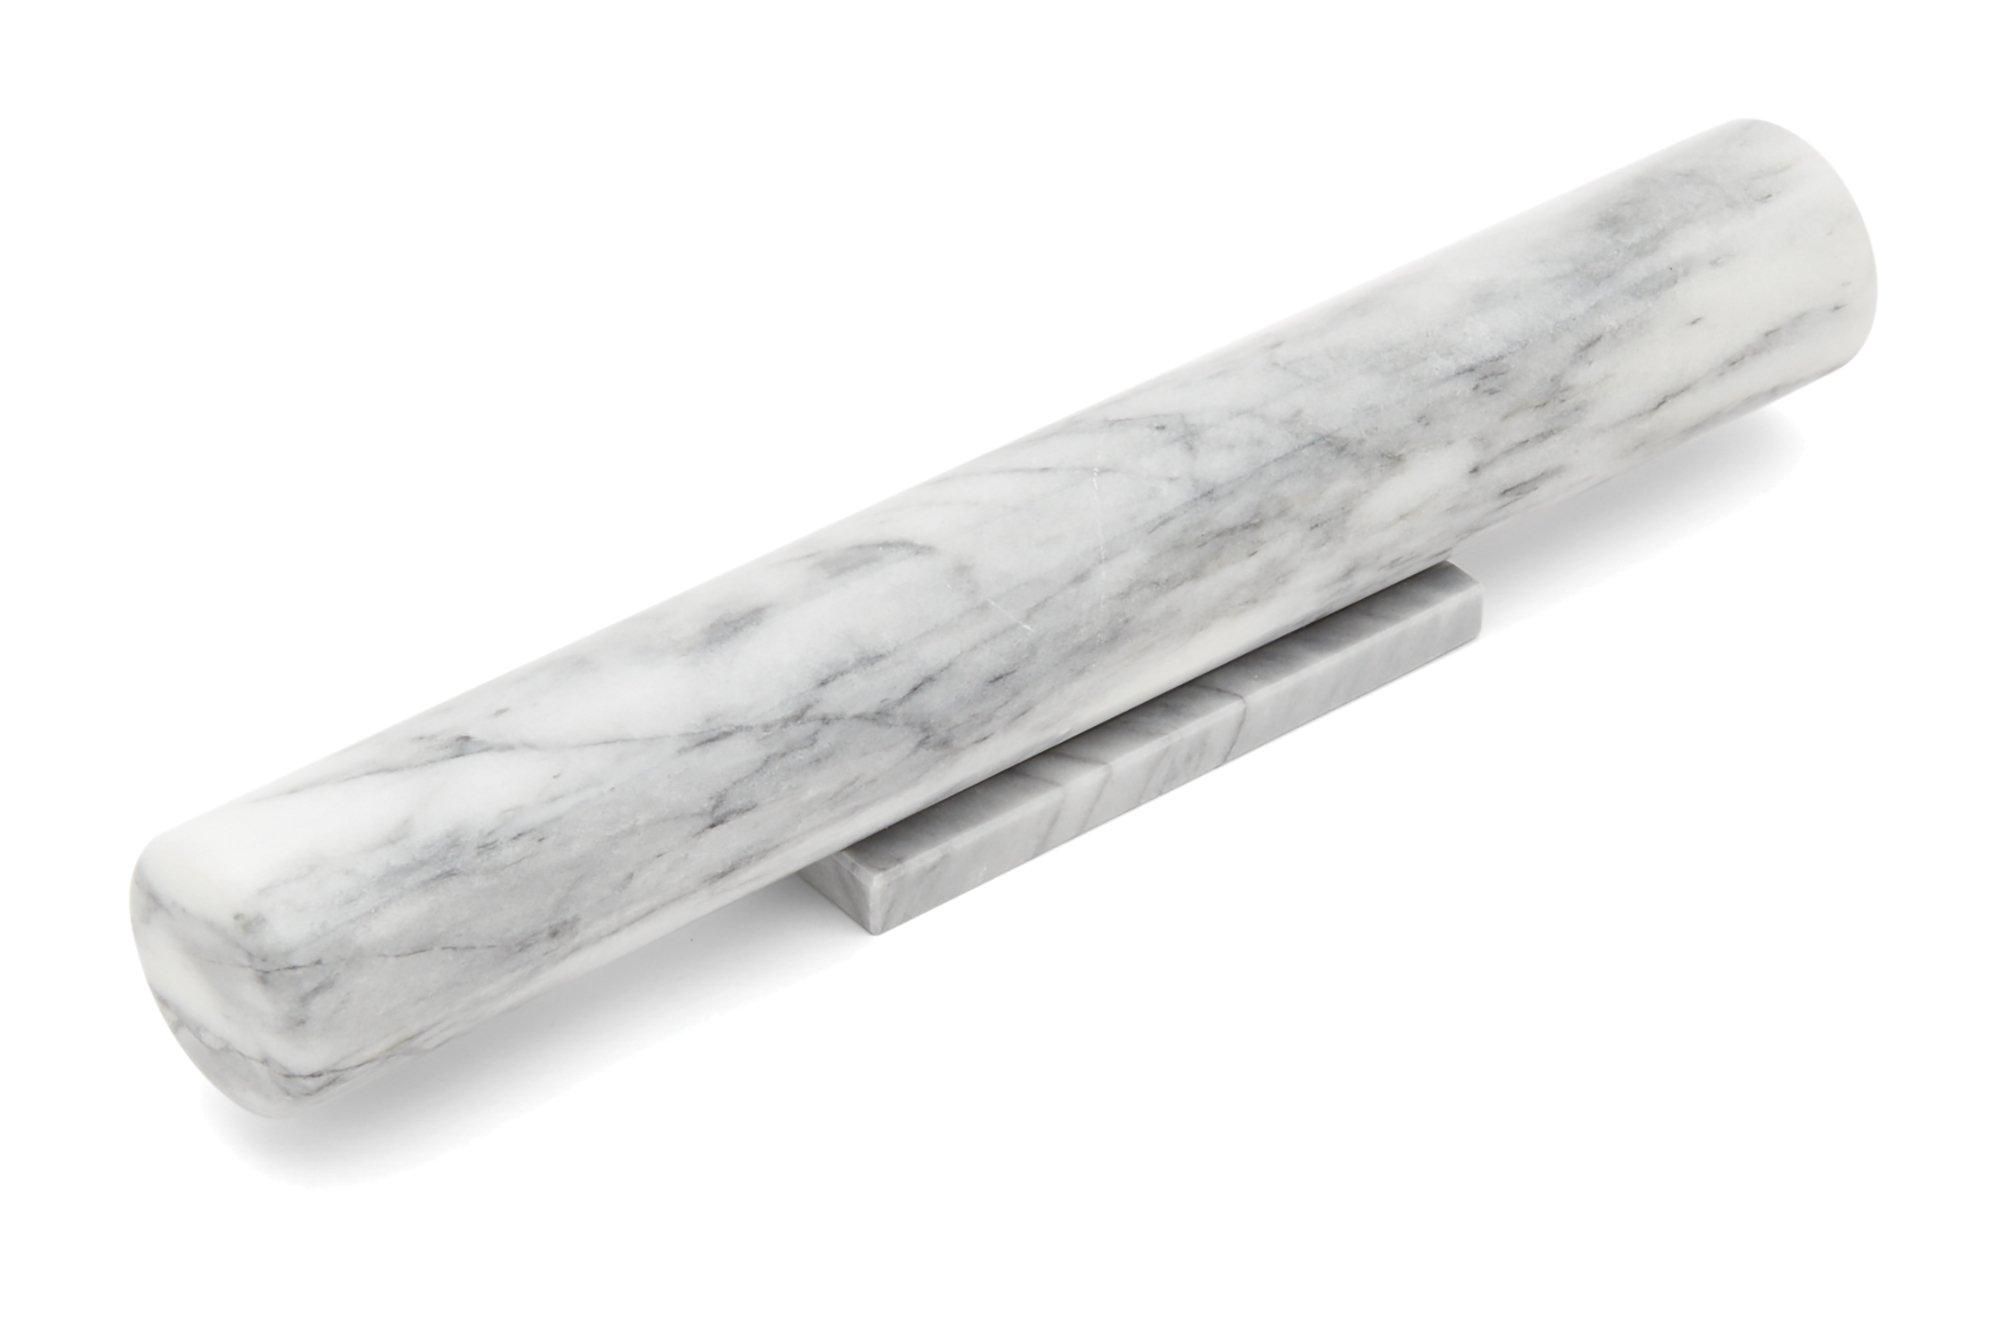 Fox Run 11711 Marble French Rolling Pin, Base, White